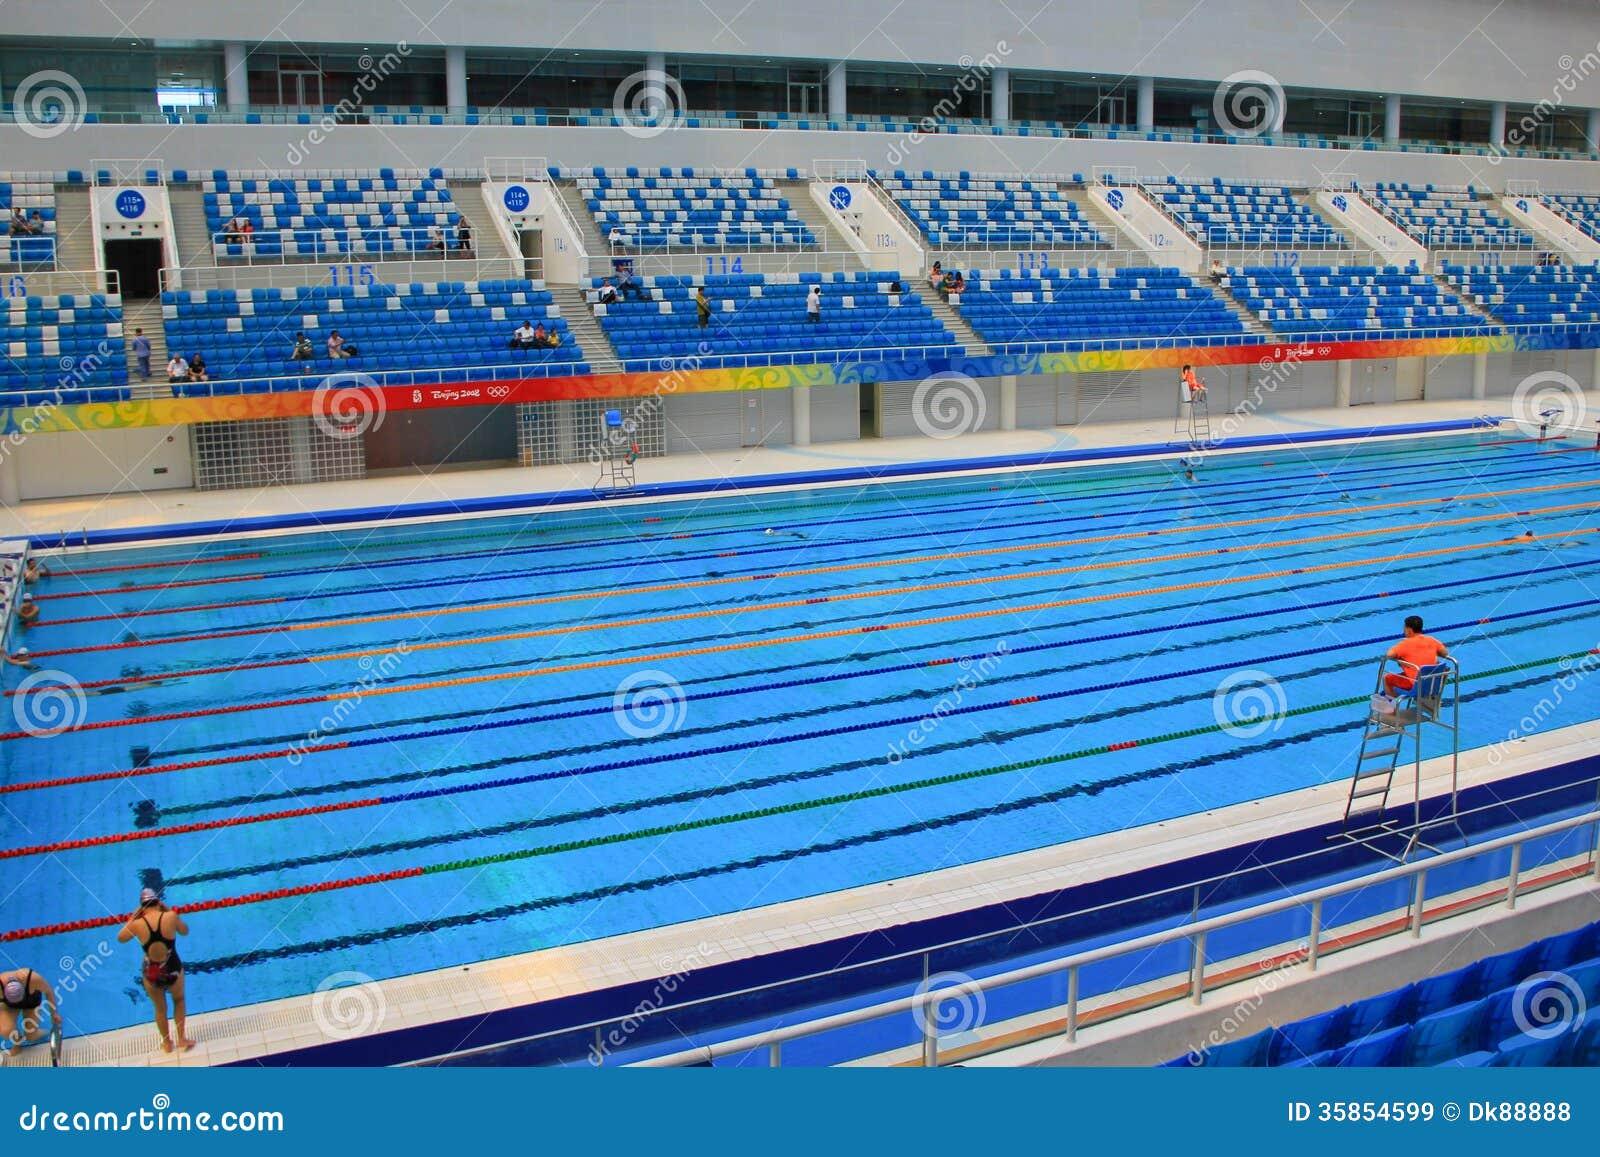 Beijing 2008 Olympic Swimming Pool Editorial Stock Image Image 35854599